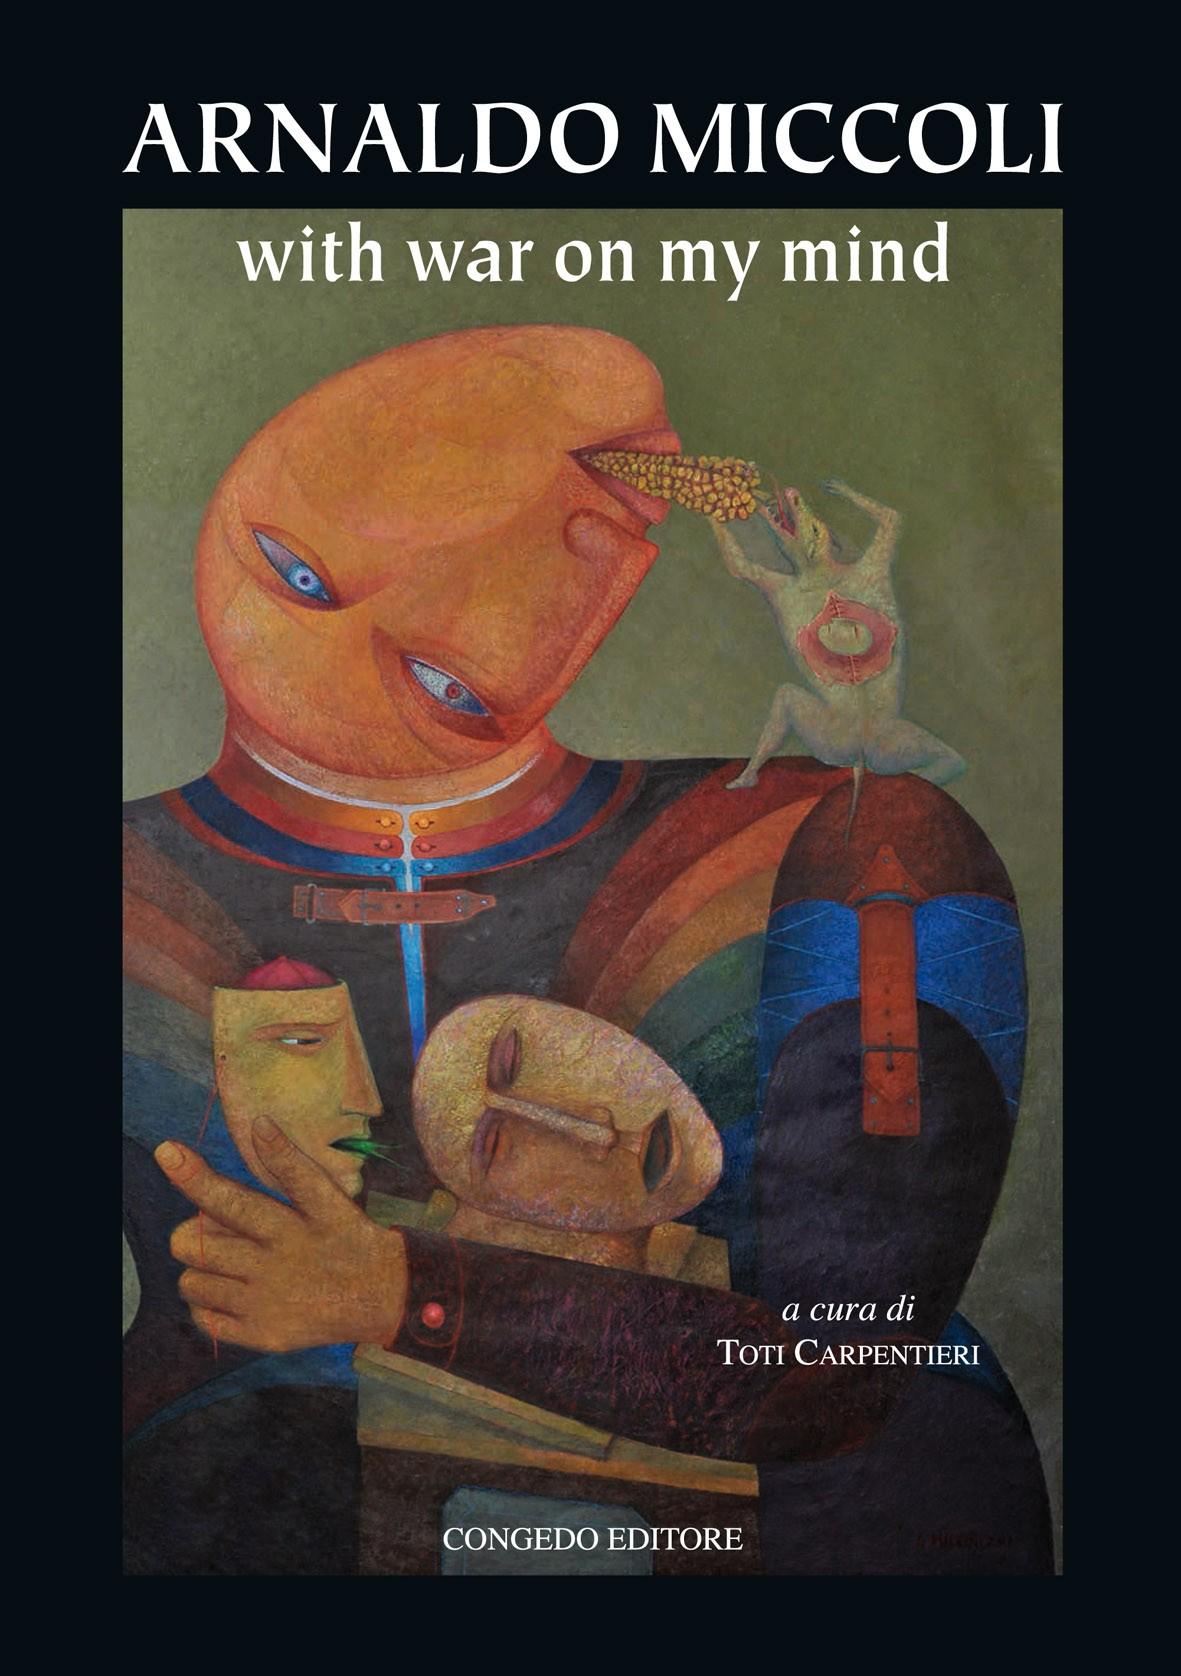 Arnaldo Miccoli. With war on my mind